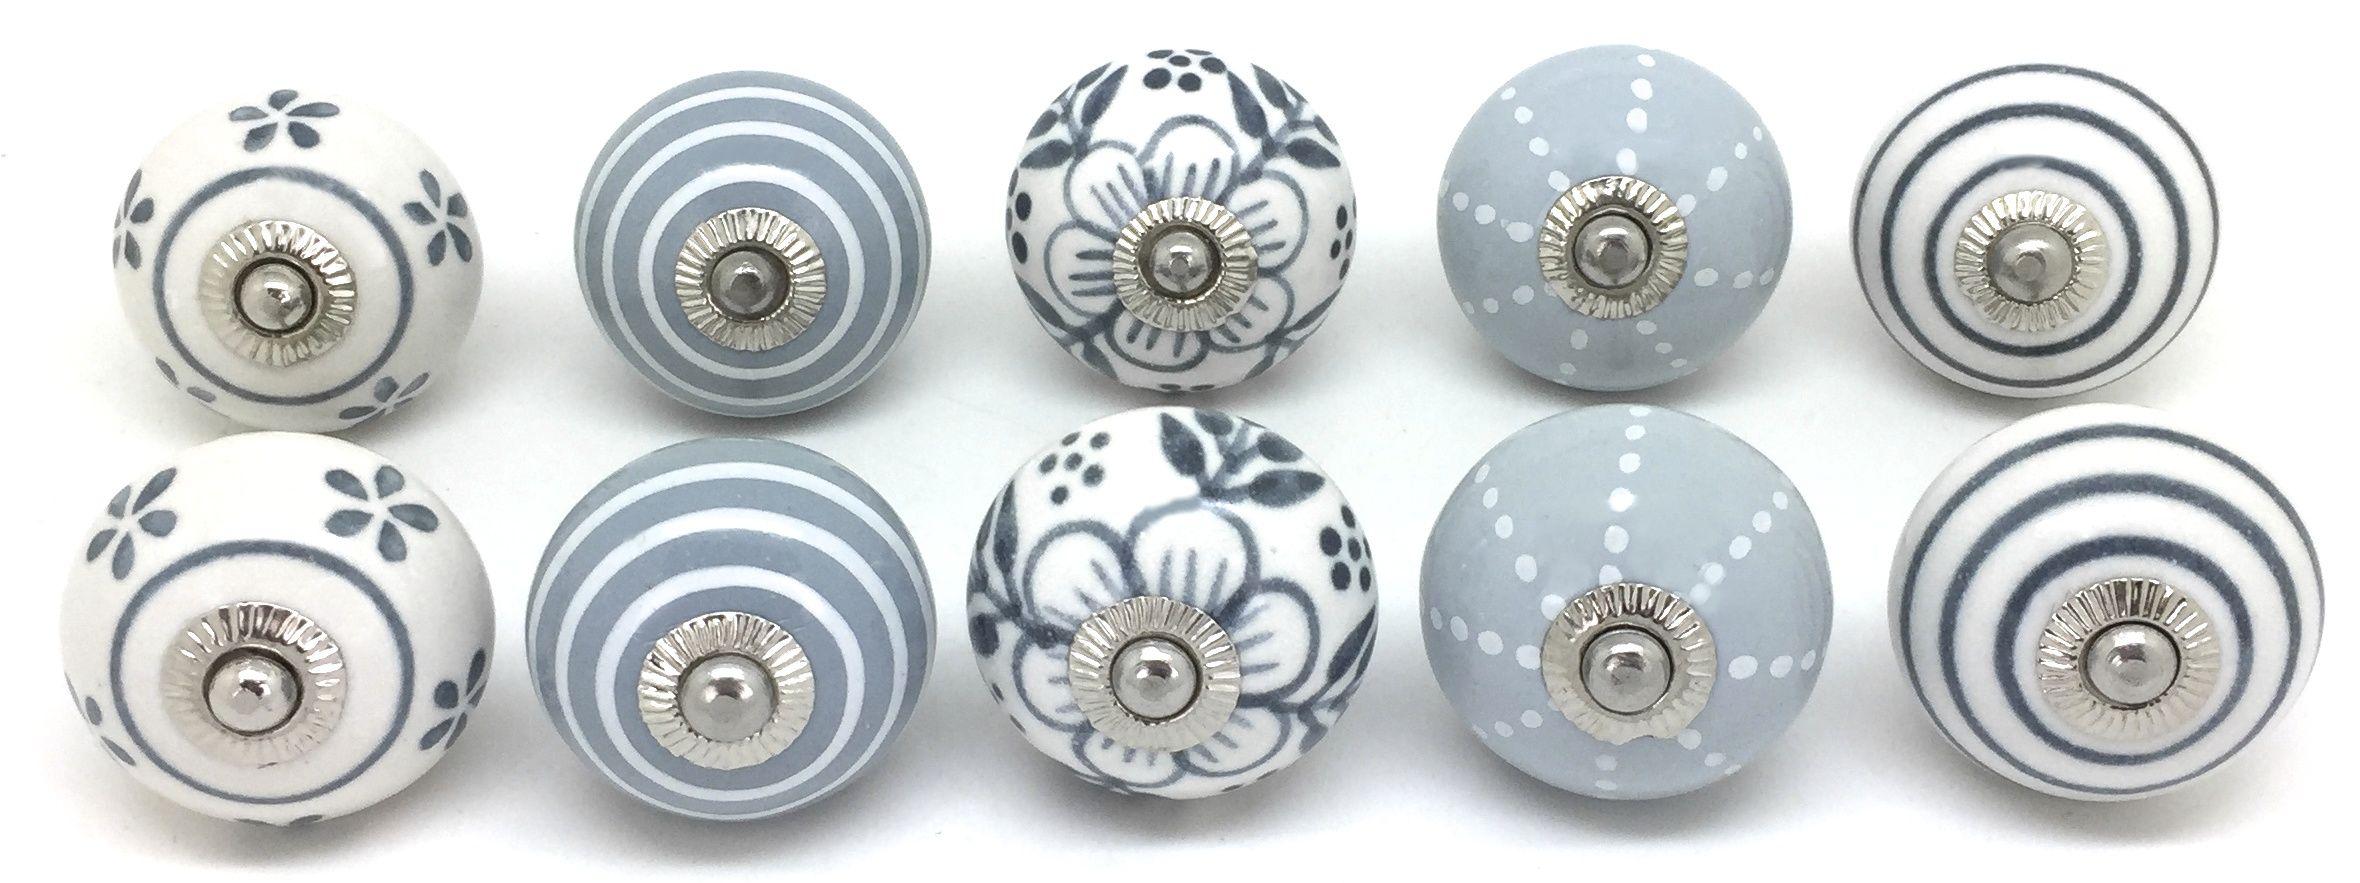 Ceramic Drawer Pulls Kitchen Best Pull Down Faucet Door Knobs Cupboard